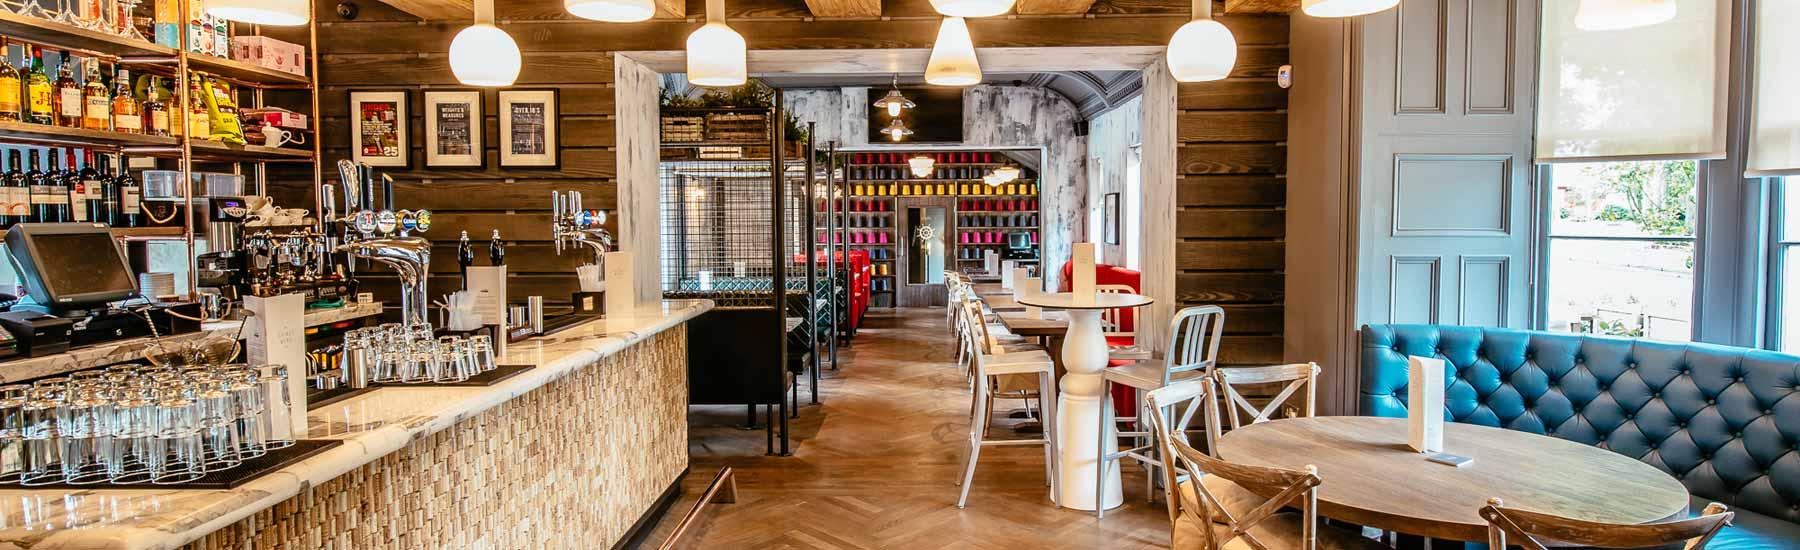 pub and kitchen kilmarnock